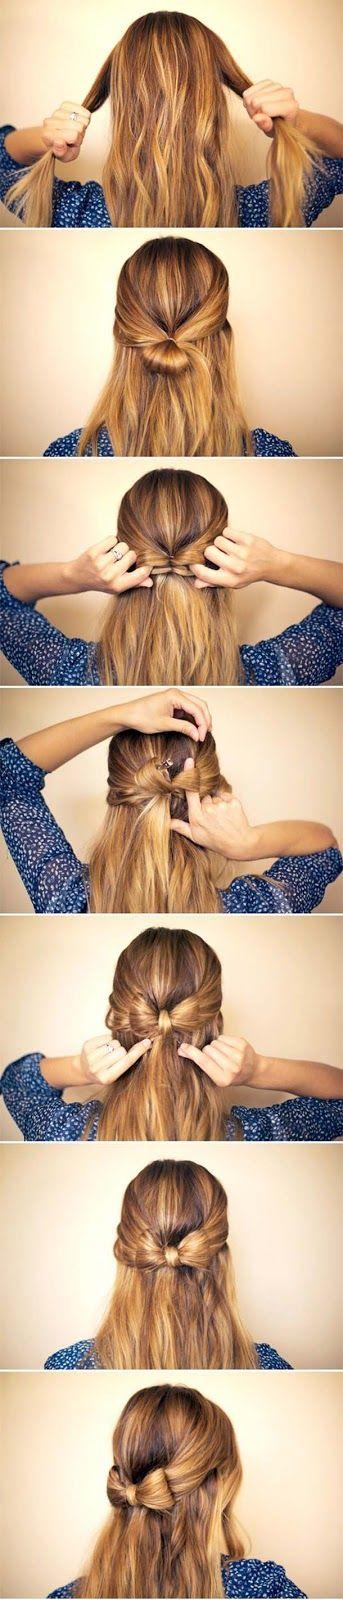 pelo suelto con lazo